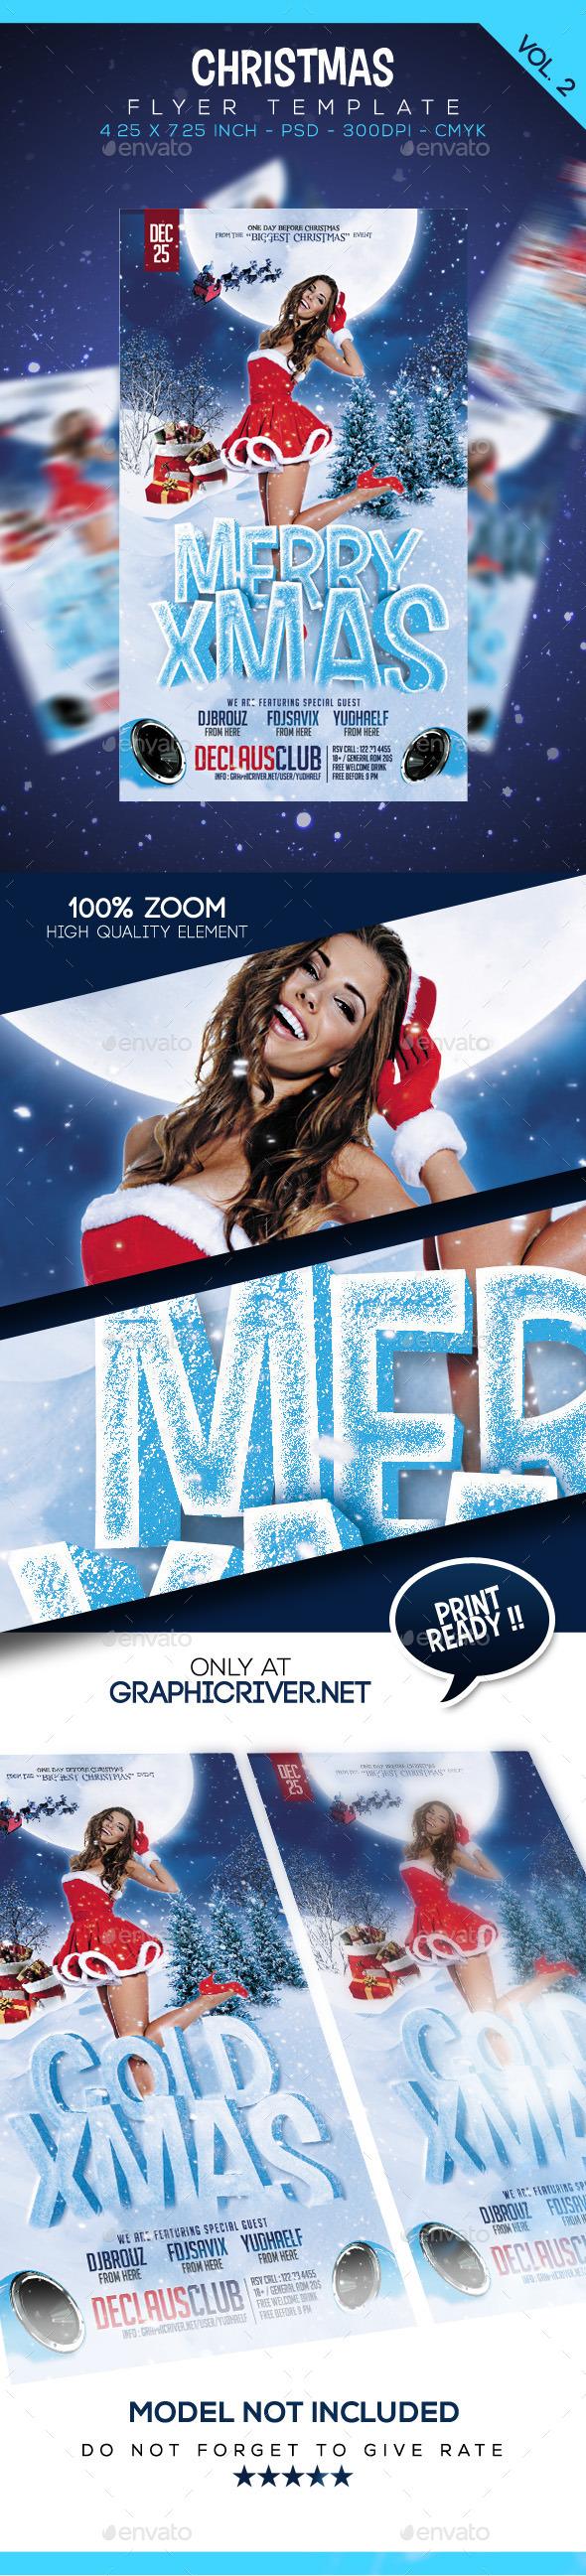 GraphicRiver Christmas Flyer Vol 2 9683665